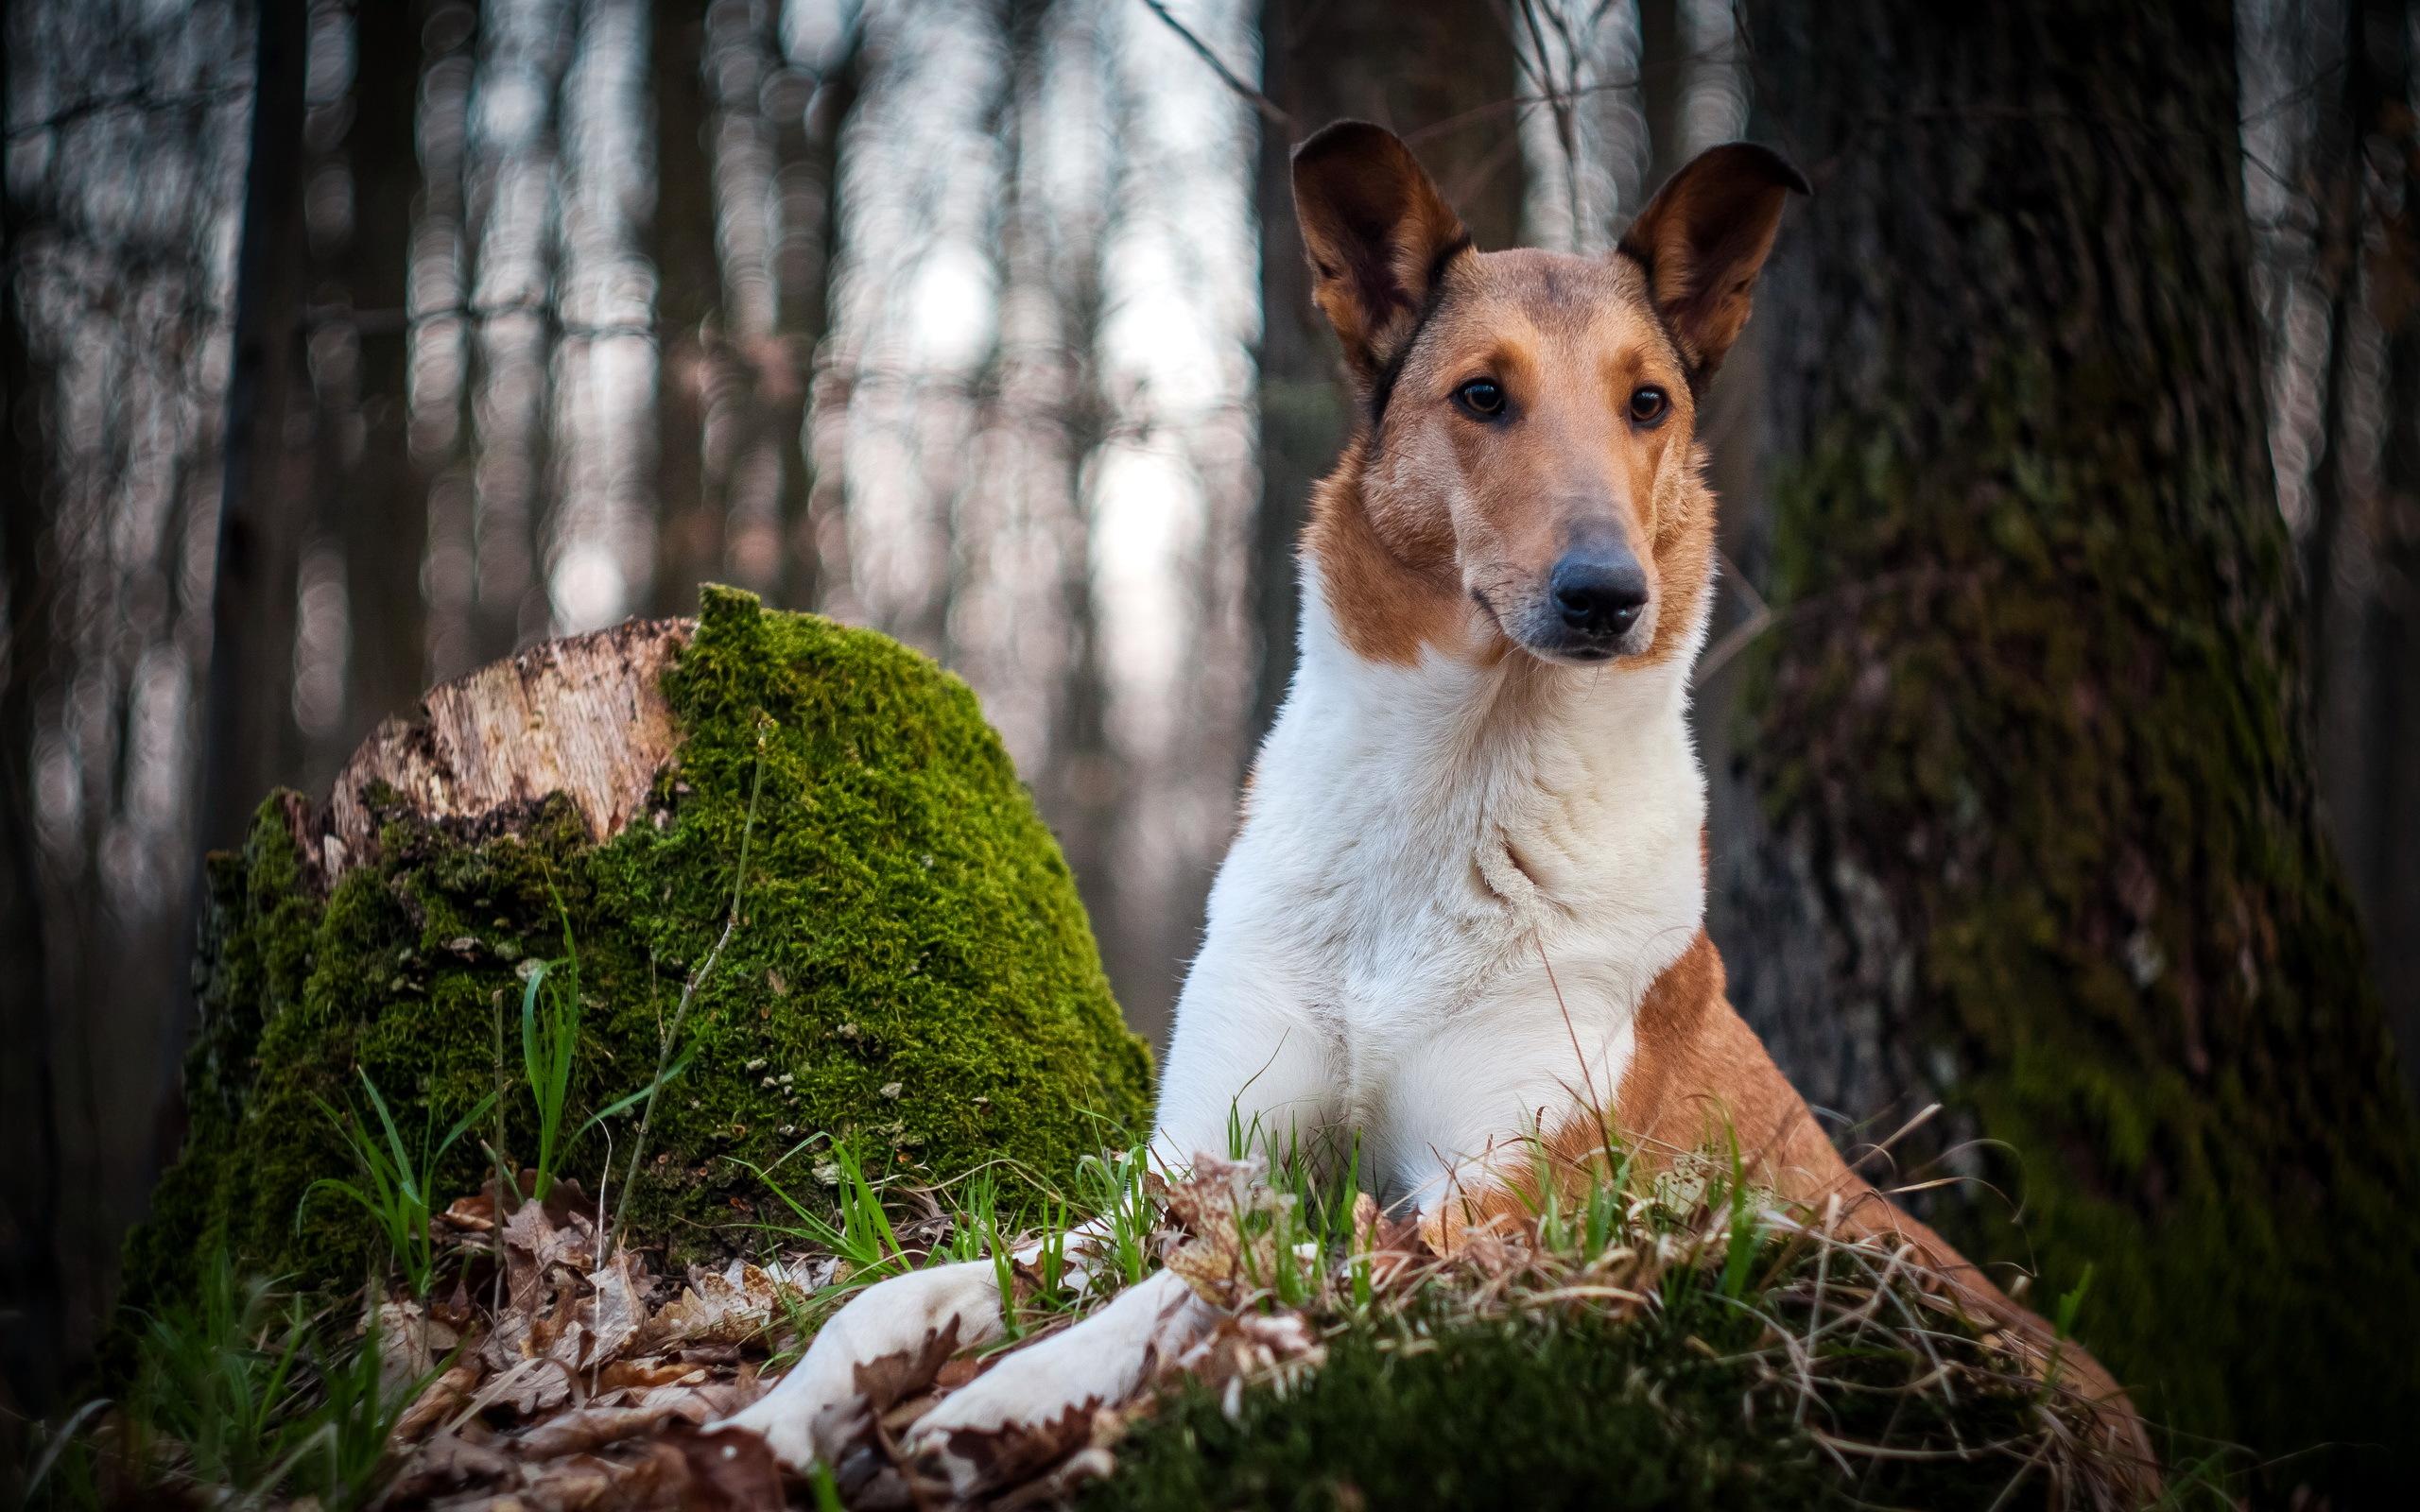 собака пенек блики бесплатно